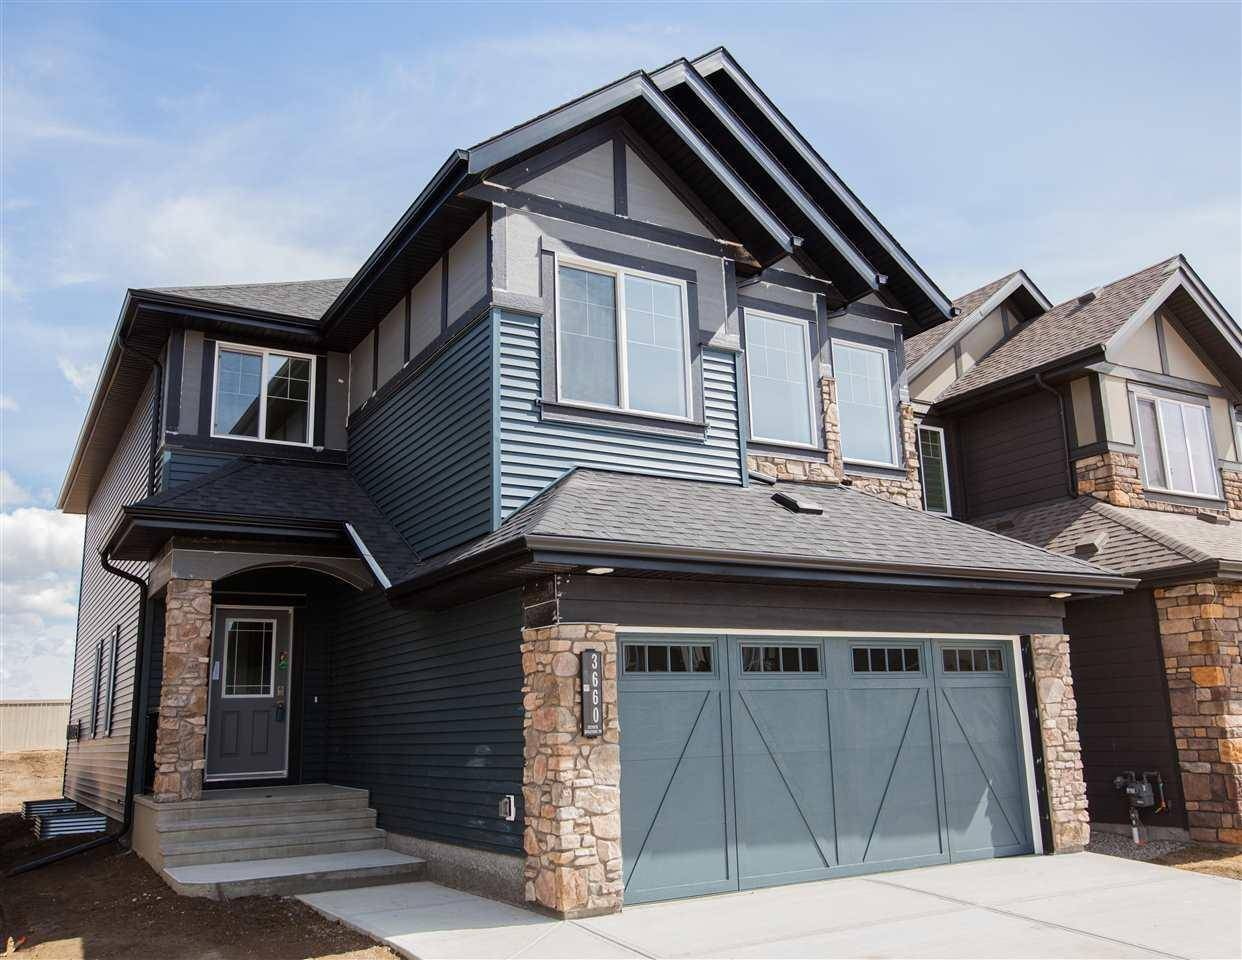 House for sale at 3660 Keswick Blvd Sw Edmonton Alberta - MLS: E4193091